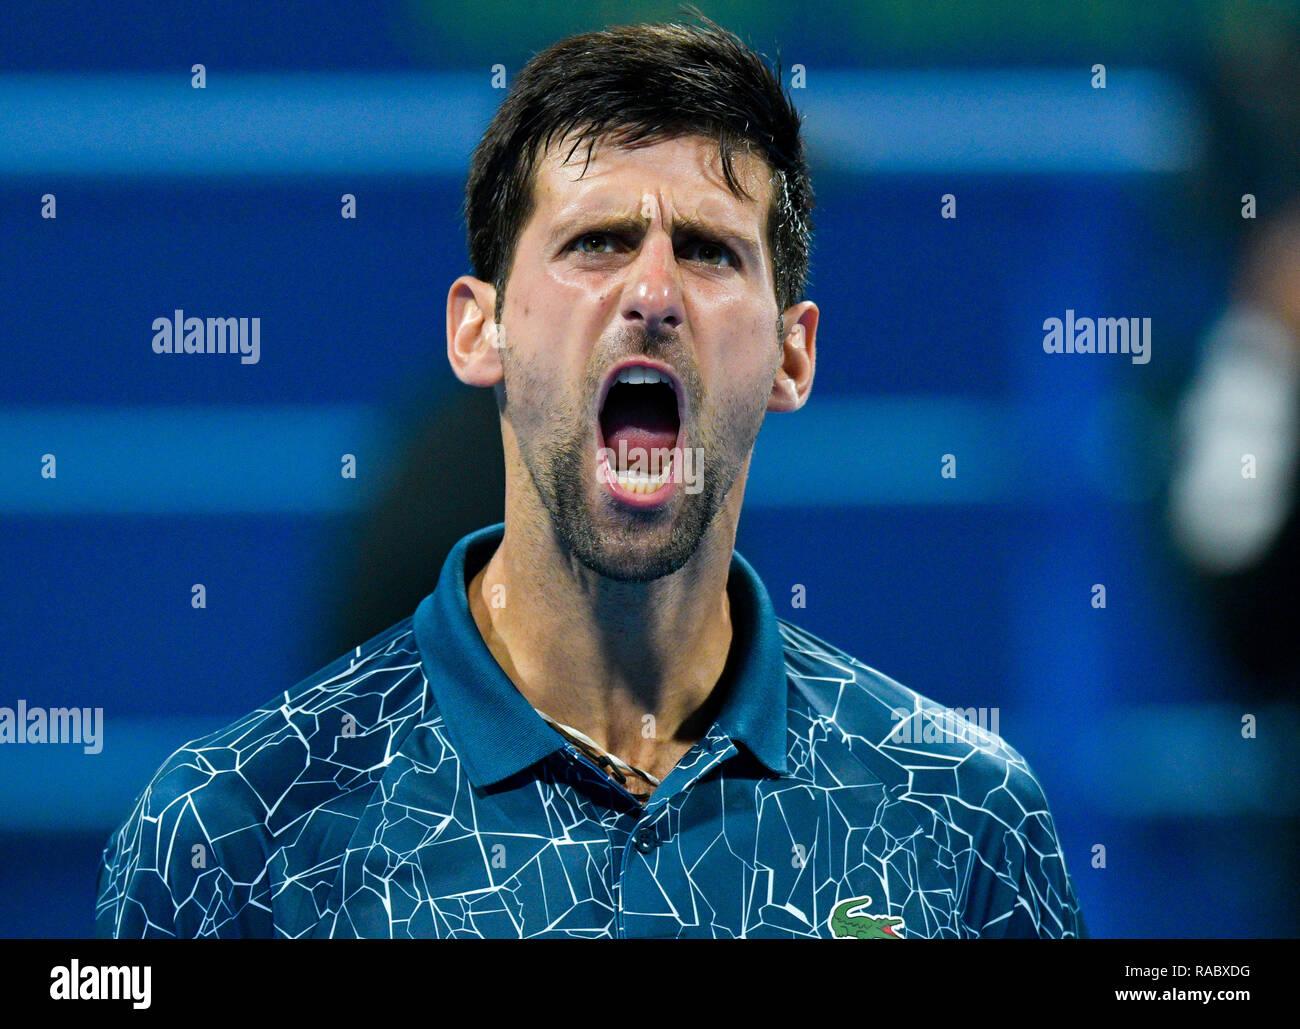 Doha, Qatar. 3rd Jan, 2019. Novak Djokovic of Serbia celebrates after the singles quarterfinal match against Nikoloz Basilashvili of Georgia at the ATP Qatar Open tennis tournament in Doha, capital of Qatar, Jan. 3, 2019. Credit: Nikku/Xinhua/Alamy Live News - Stock Image